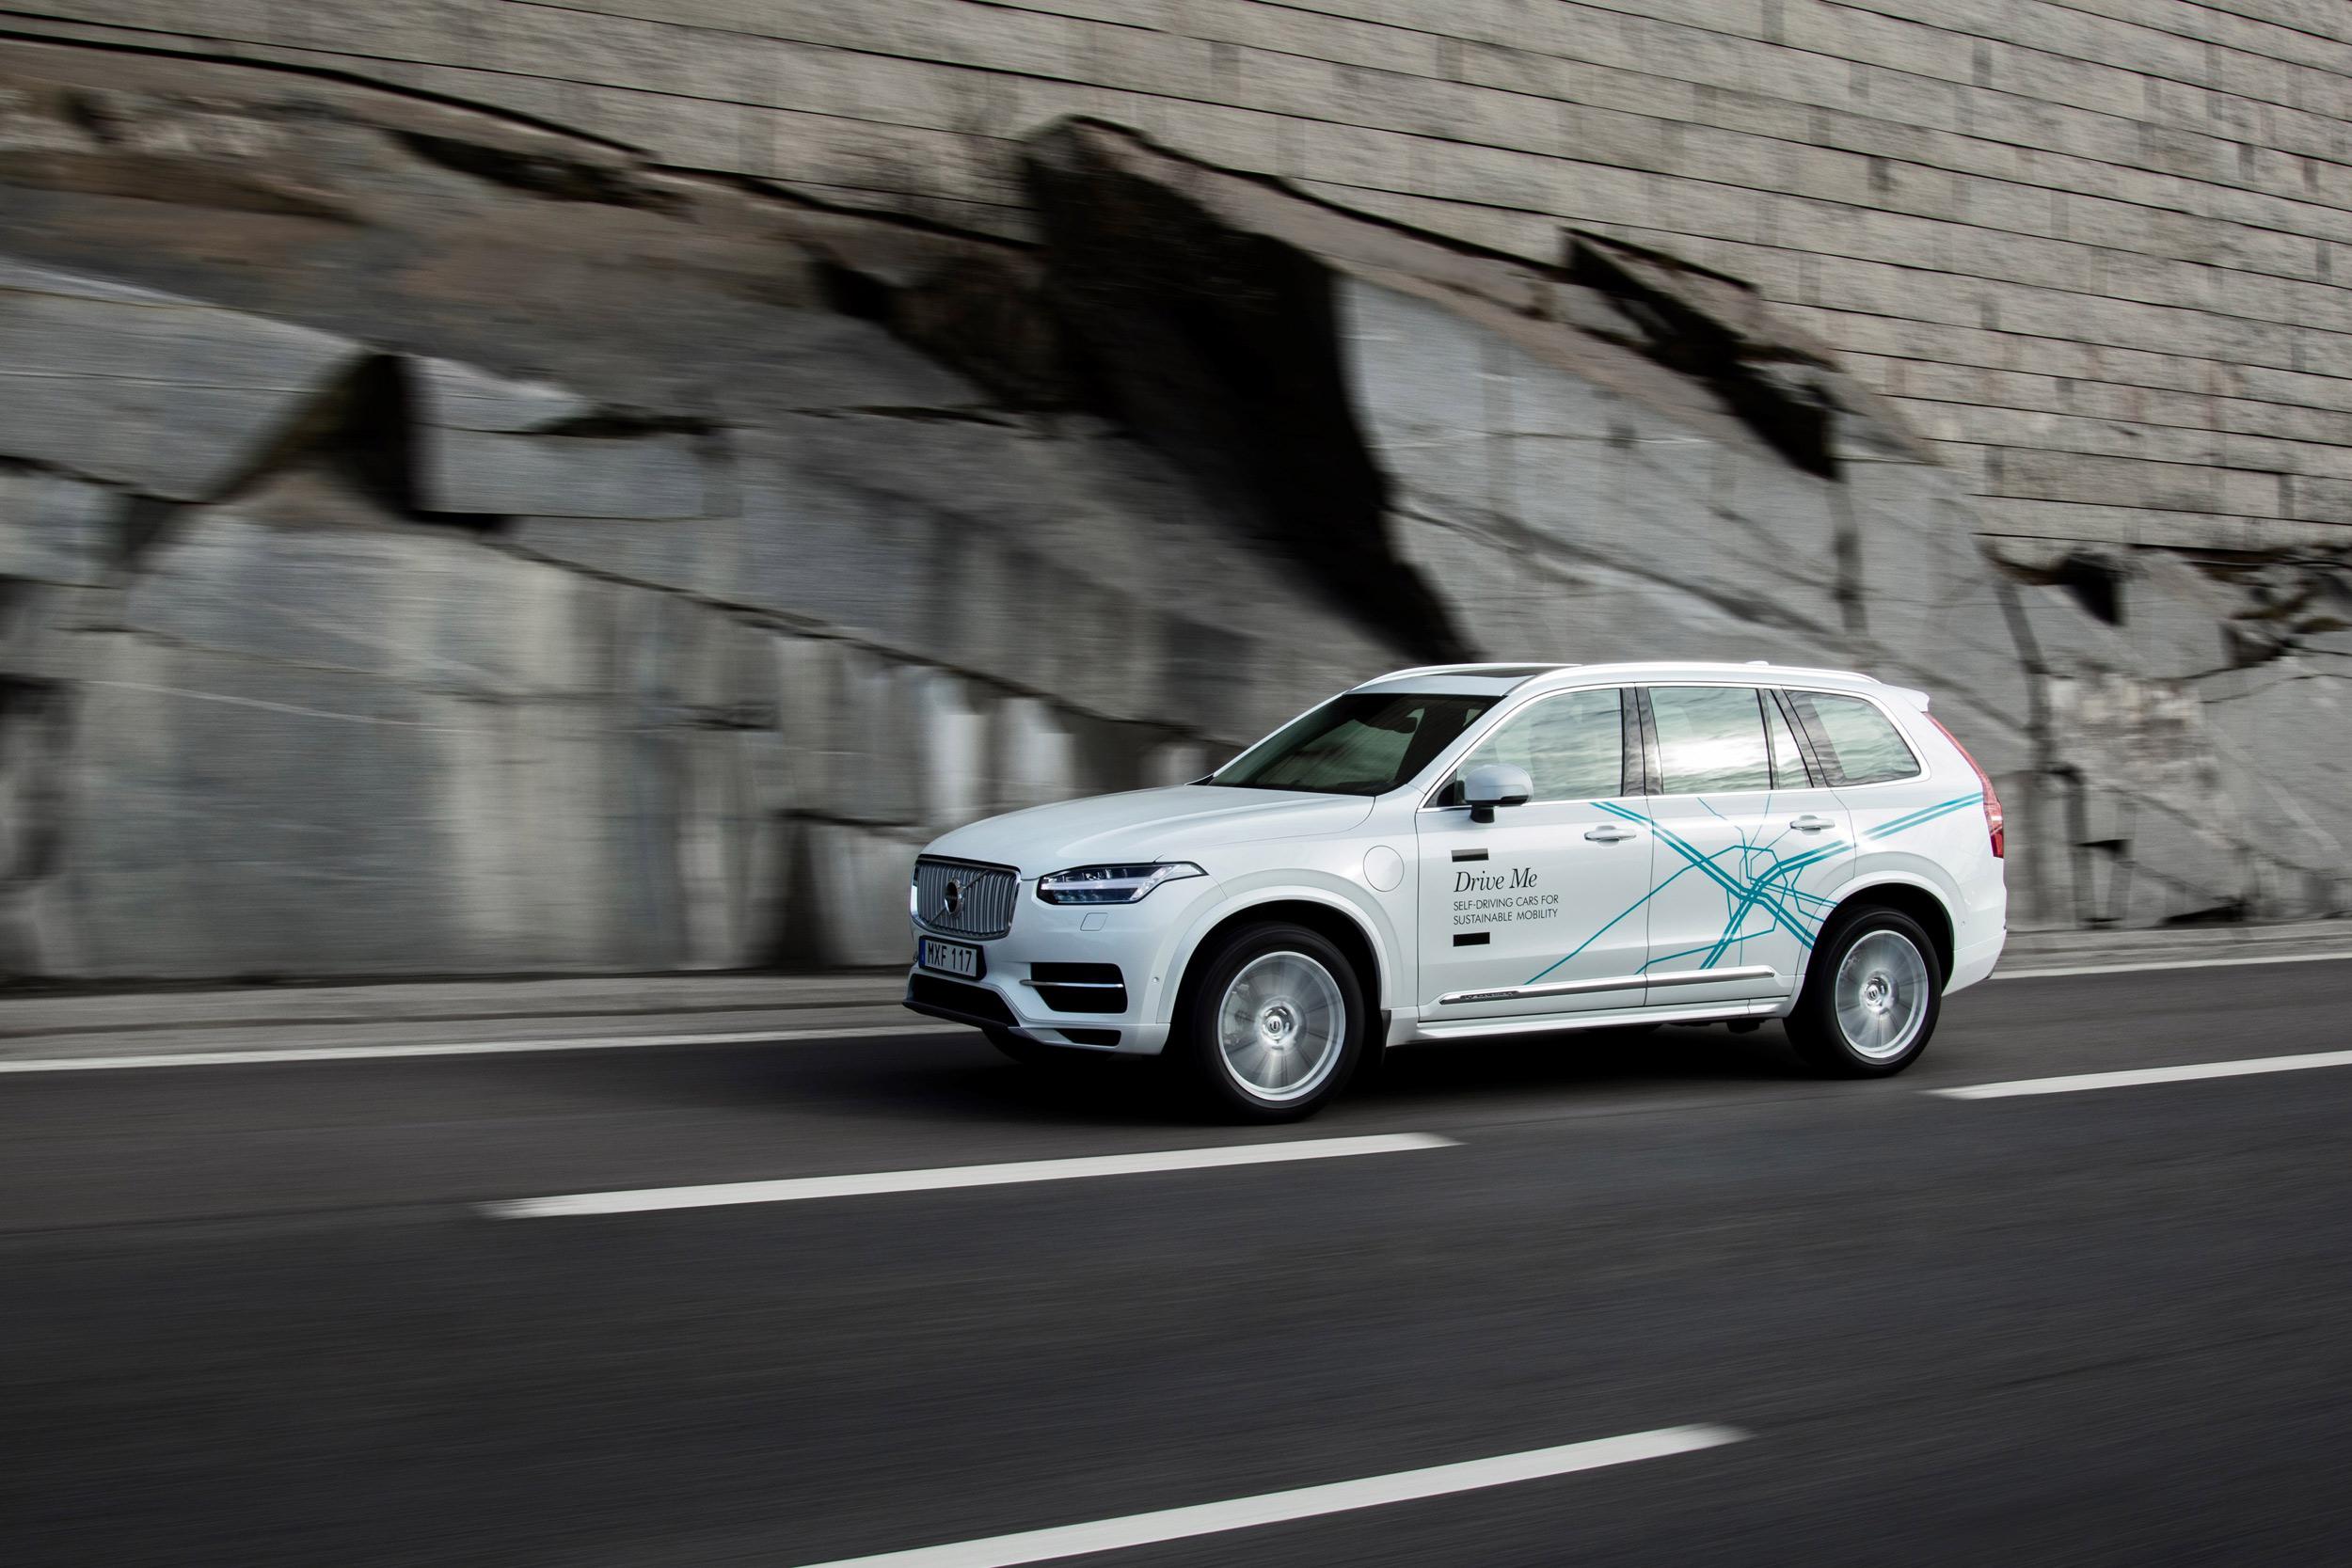 Volvo XC90 Drive-Me